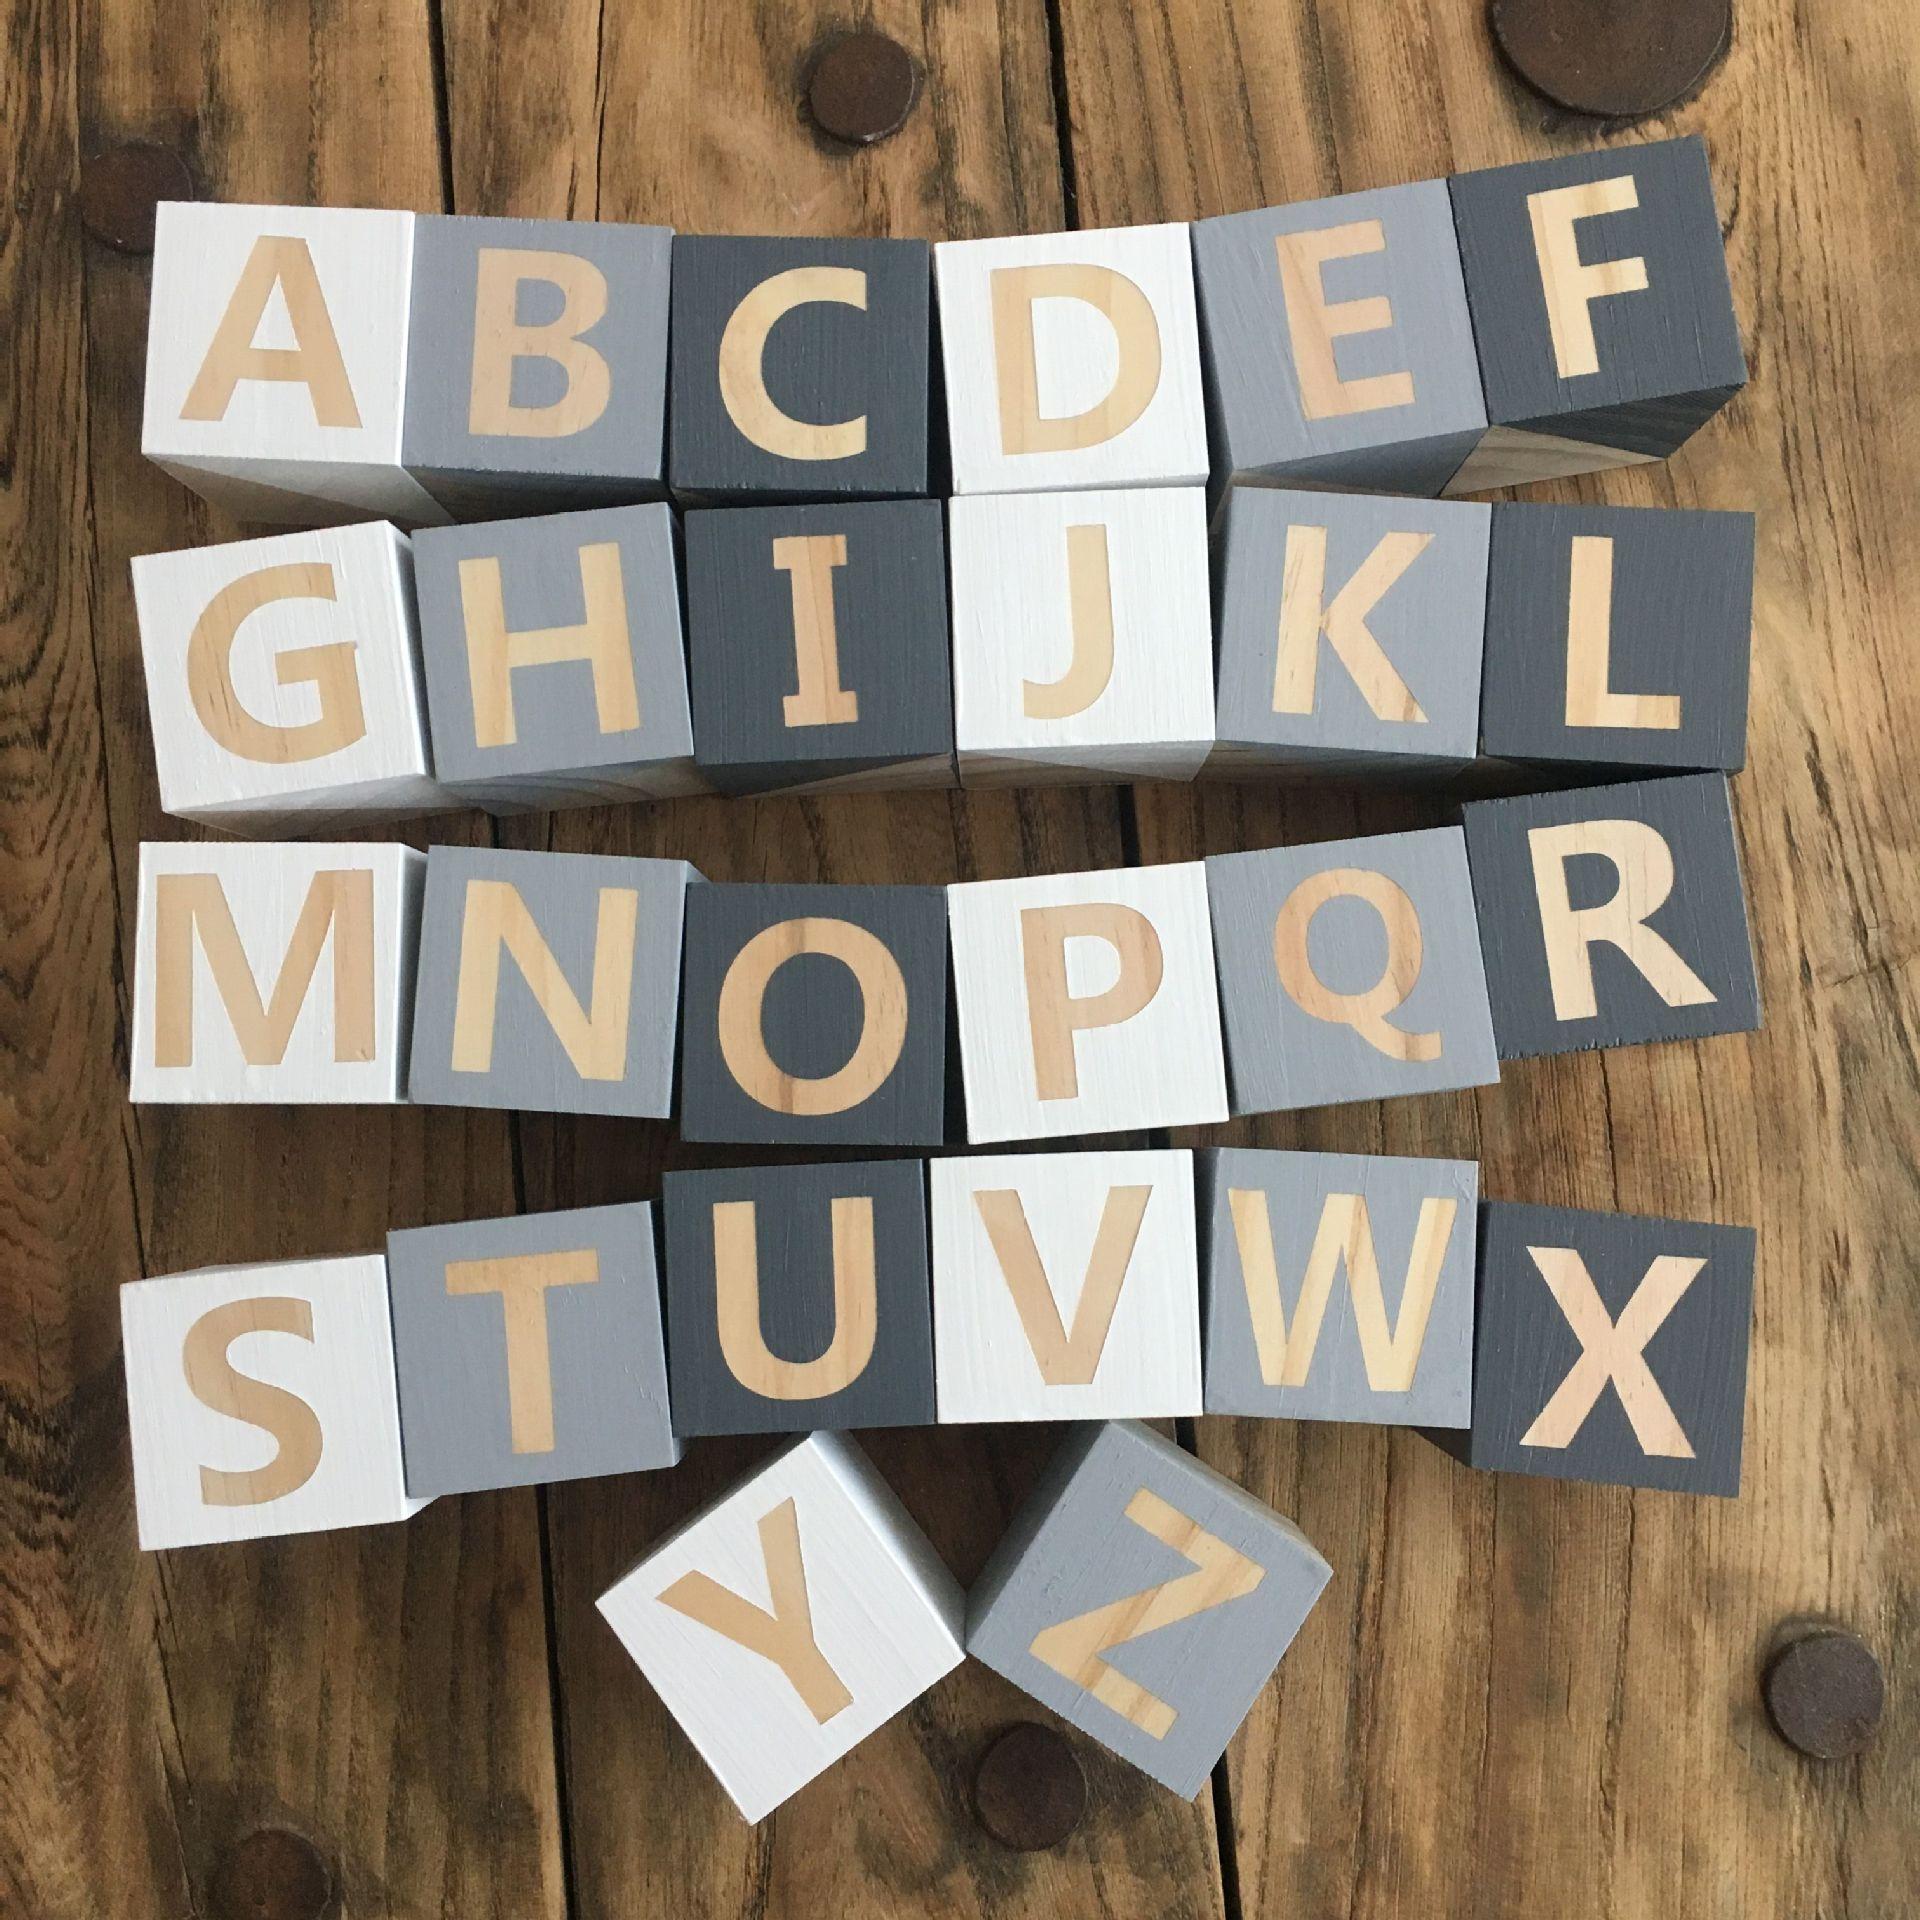 Nordic Style Wooden Alphabet Letters Baby Name Blocks For Nursery Bedroom Photo Shoot Decor Newborn Keepsake Gift White Pink